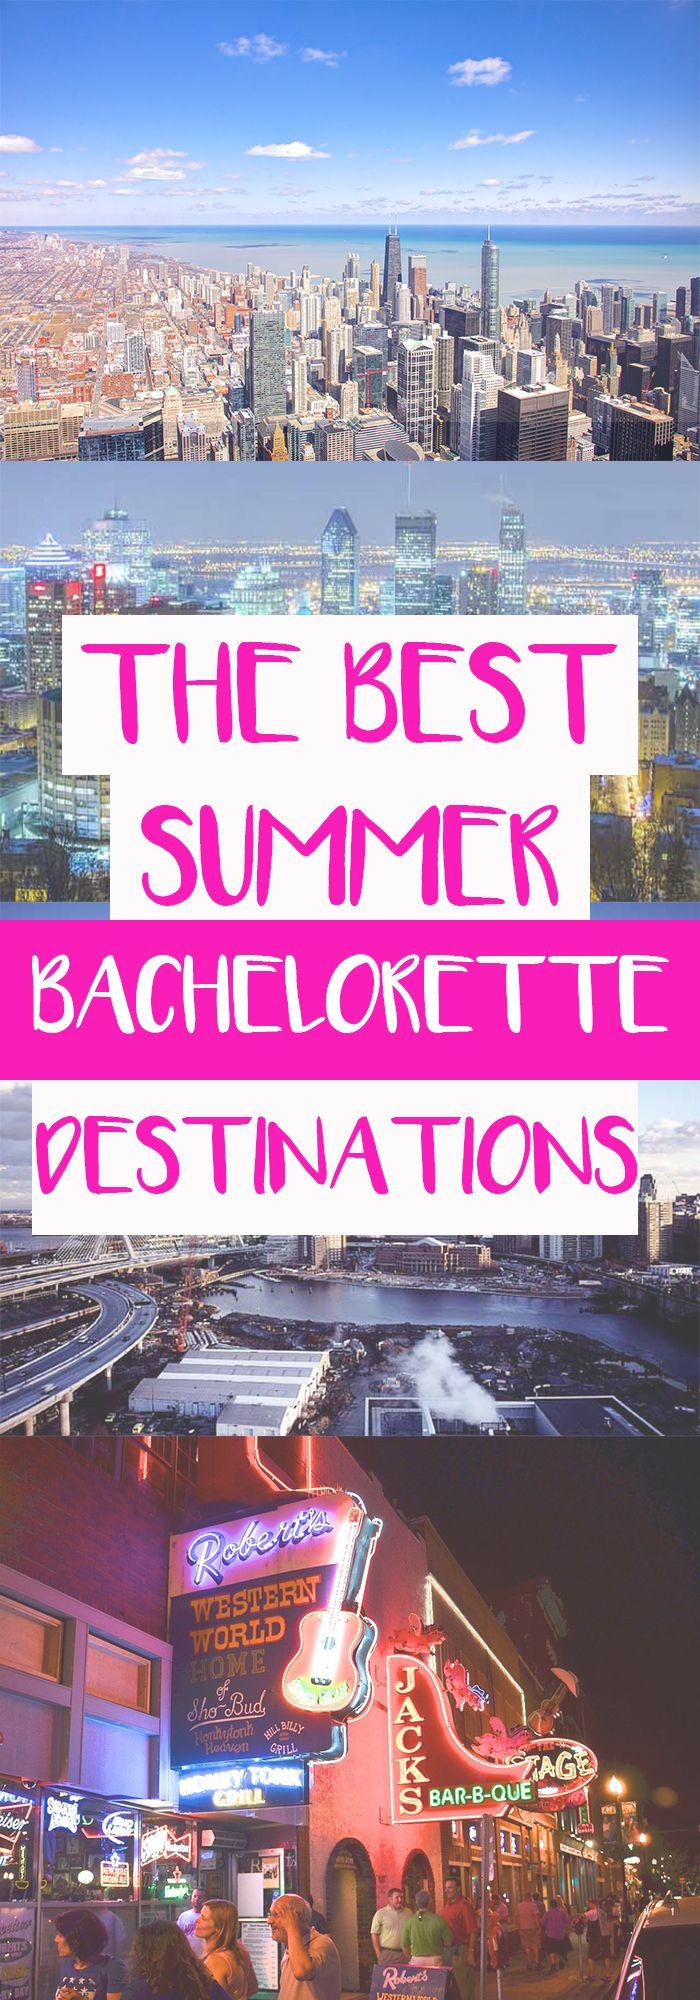 four best summer bachelorette destinations bachelorette. Black Bedroom Furniture Sets. Home Design Ideas